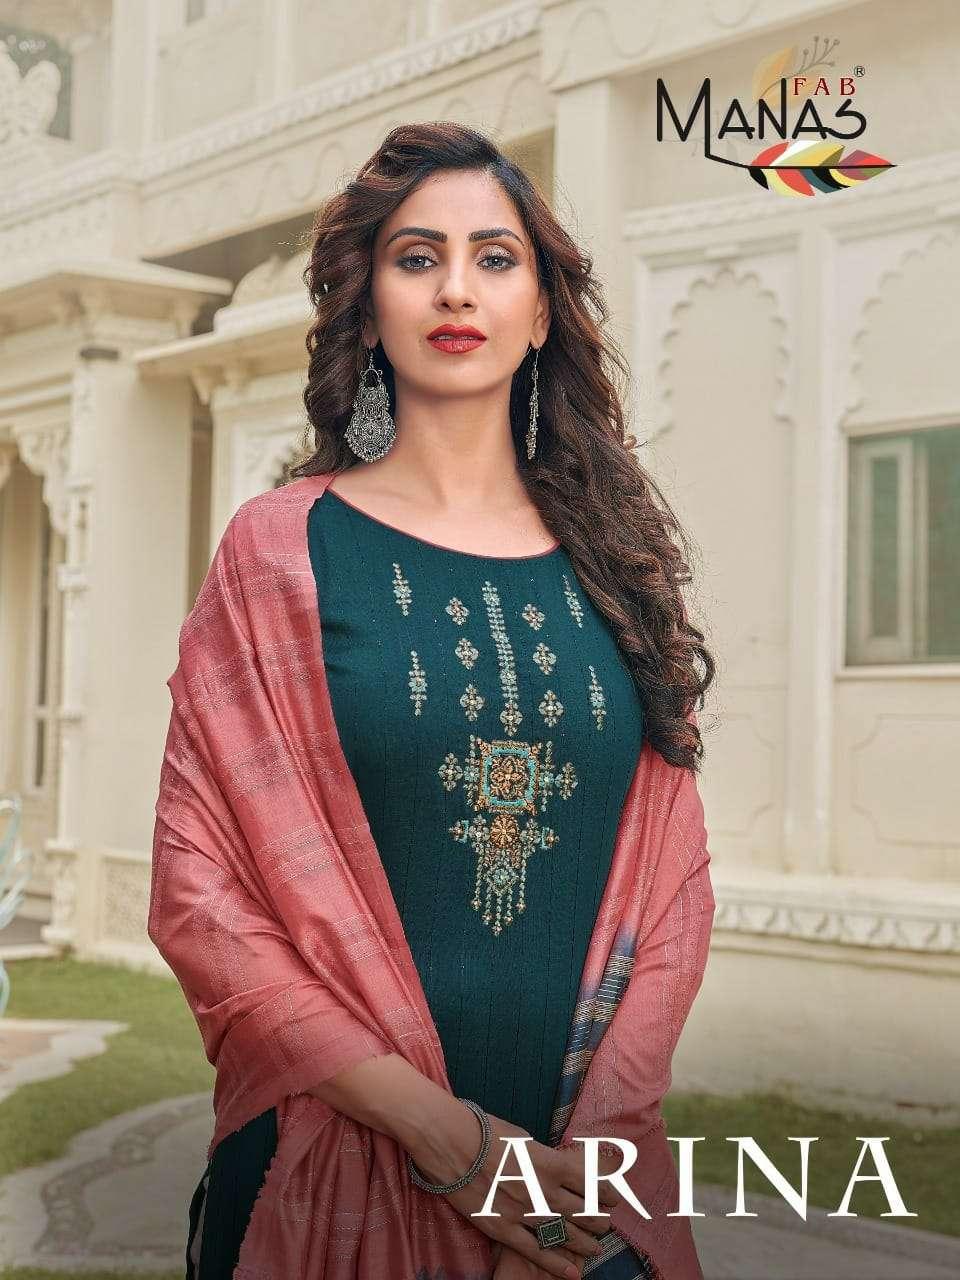 Manas fab Arina Fancy Stylish 3 Piece Set Catalog Wholesale Price